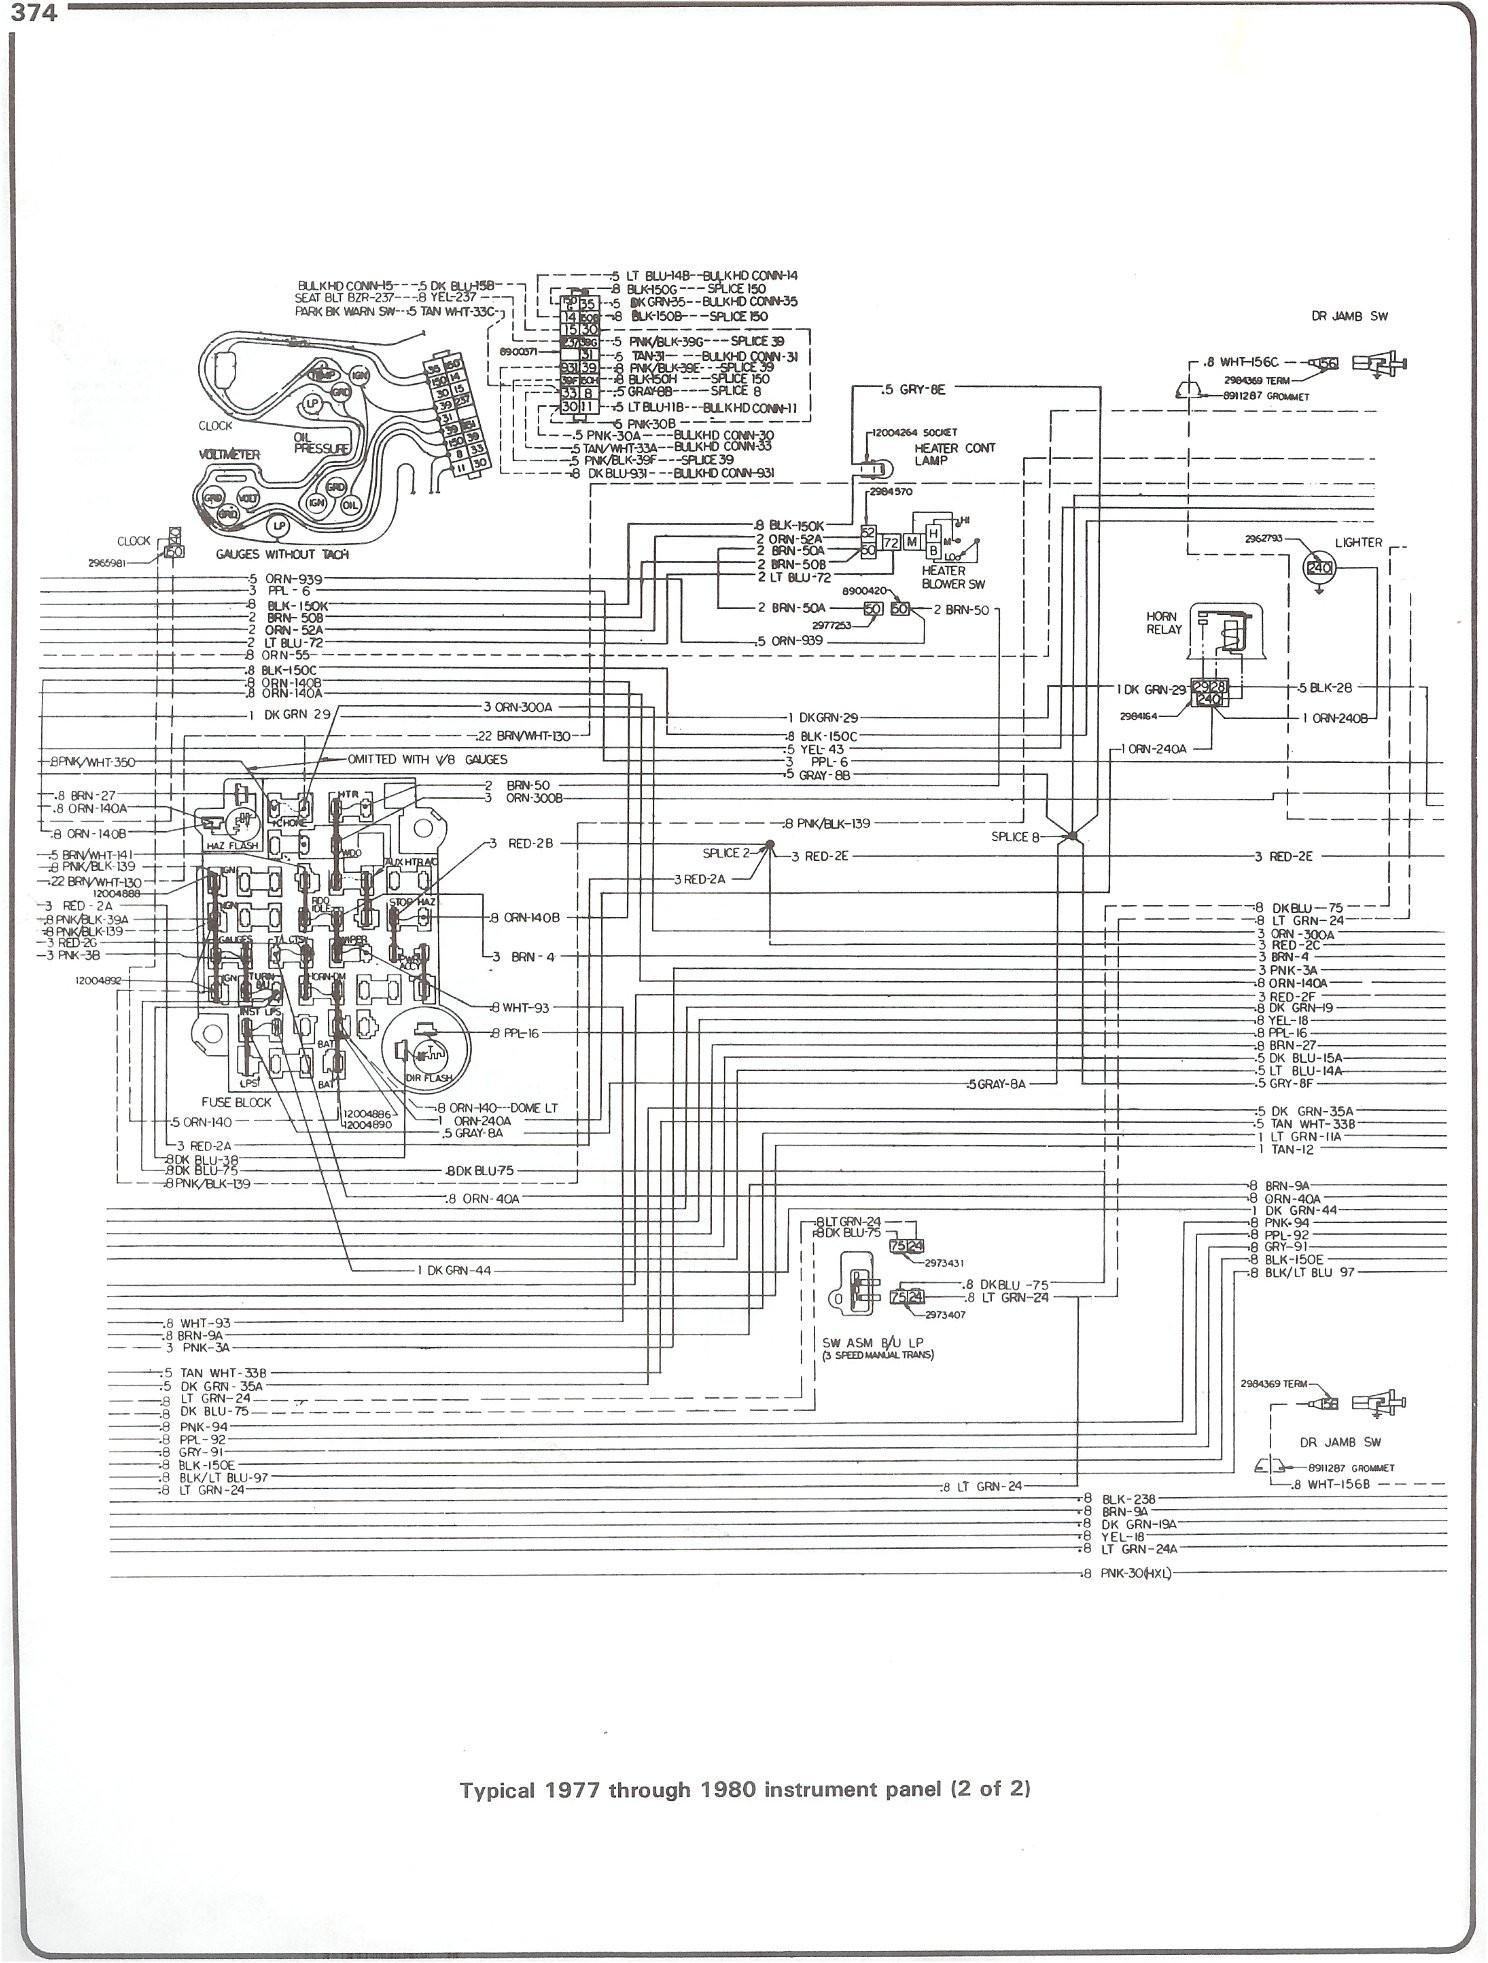 1987 454 Kawasaki Engine Diagram Wiring Diagrams Ltd En450 Headlight System Circuit 4x4 Chopper 1985